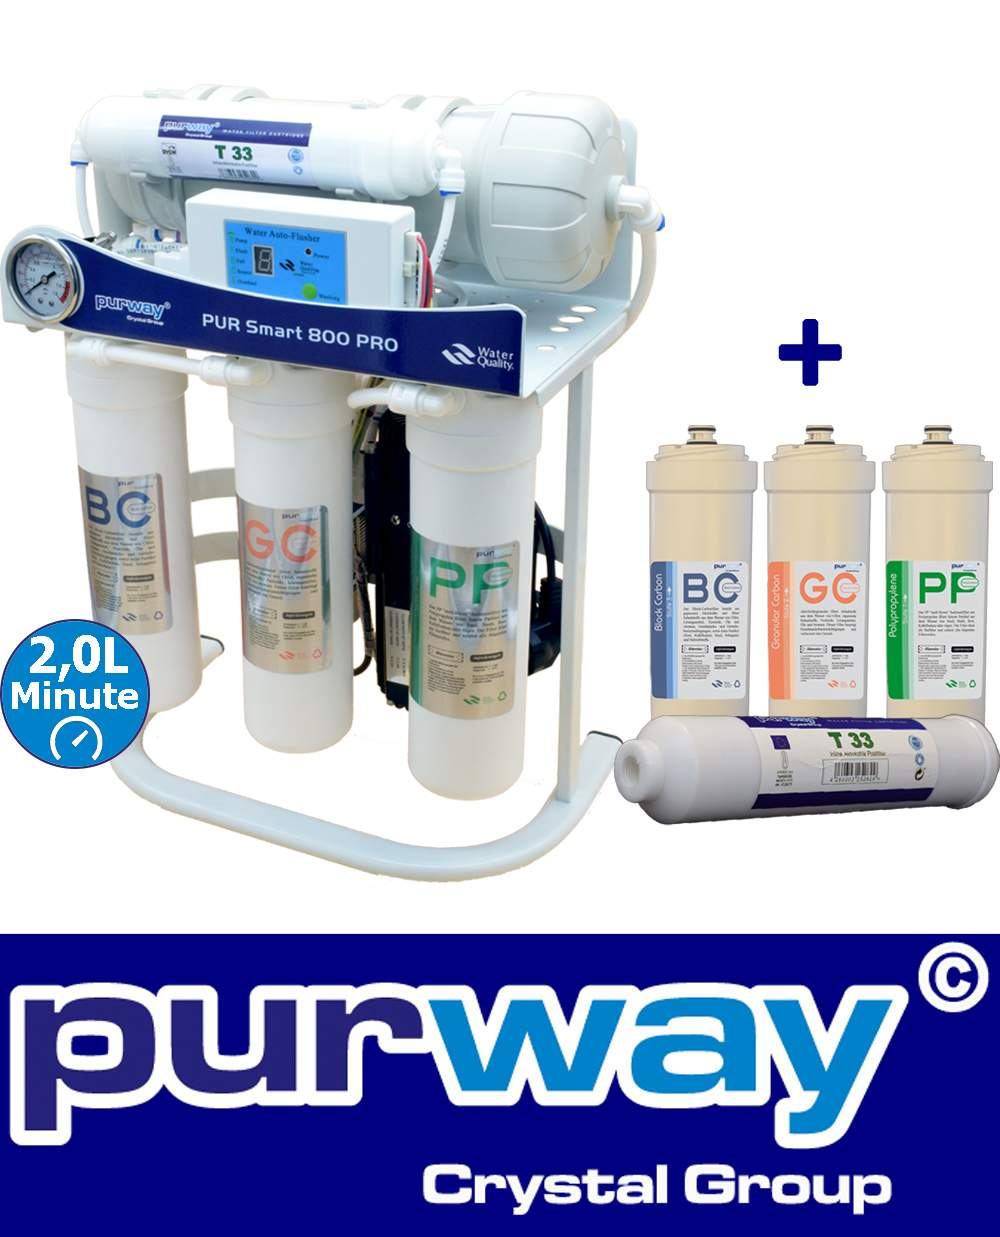 PUR Smart 800 PRO Umkehrosmoseanlage brushless bürstenlos + Ersatzfilterset